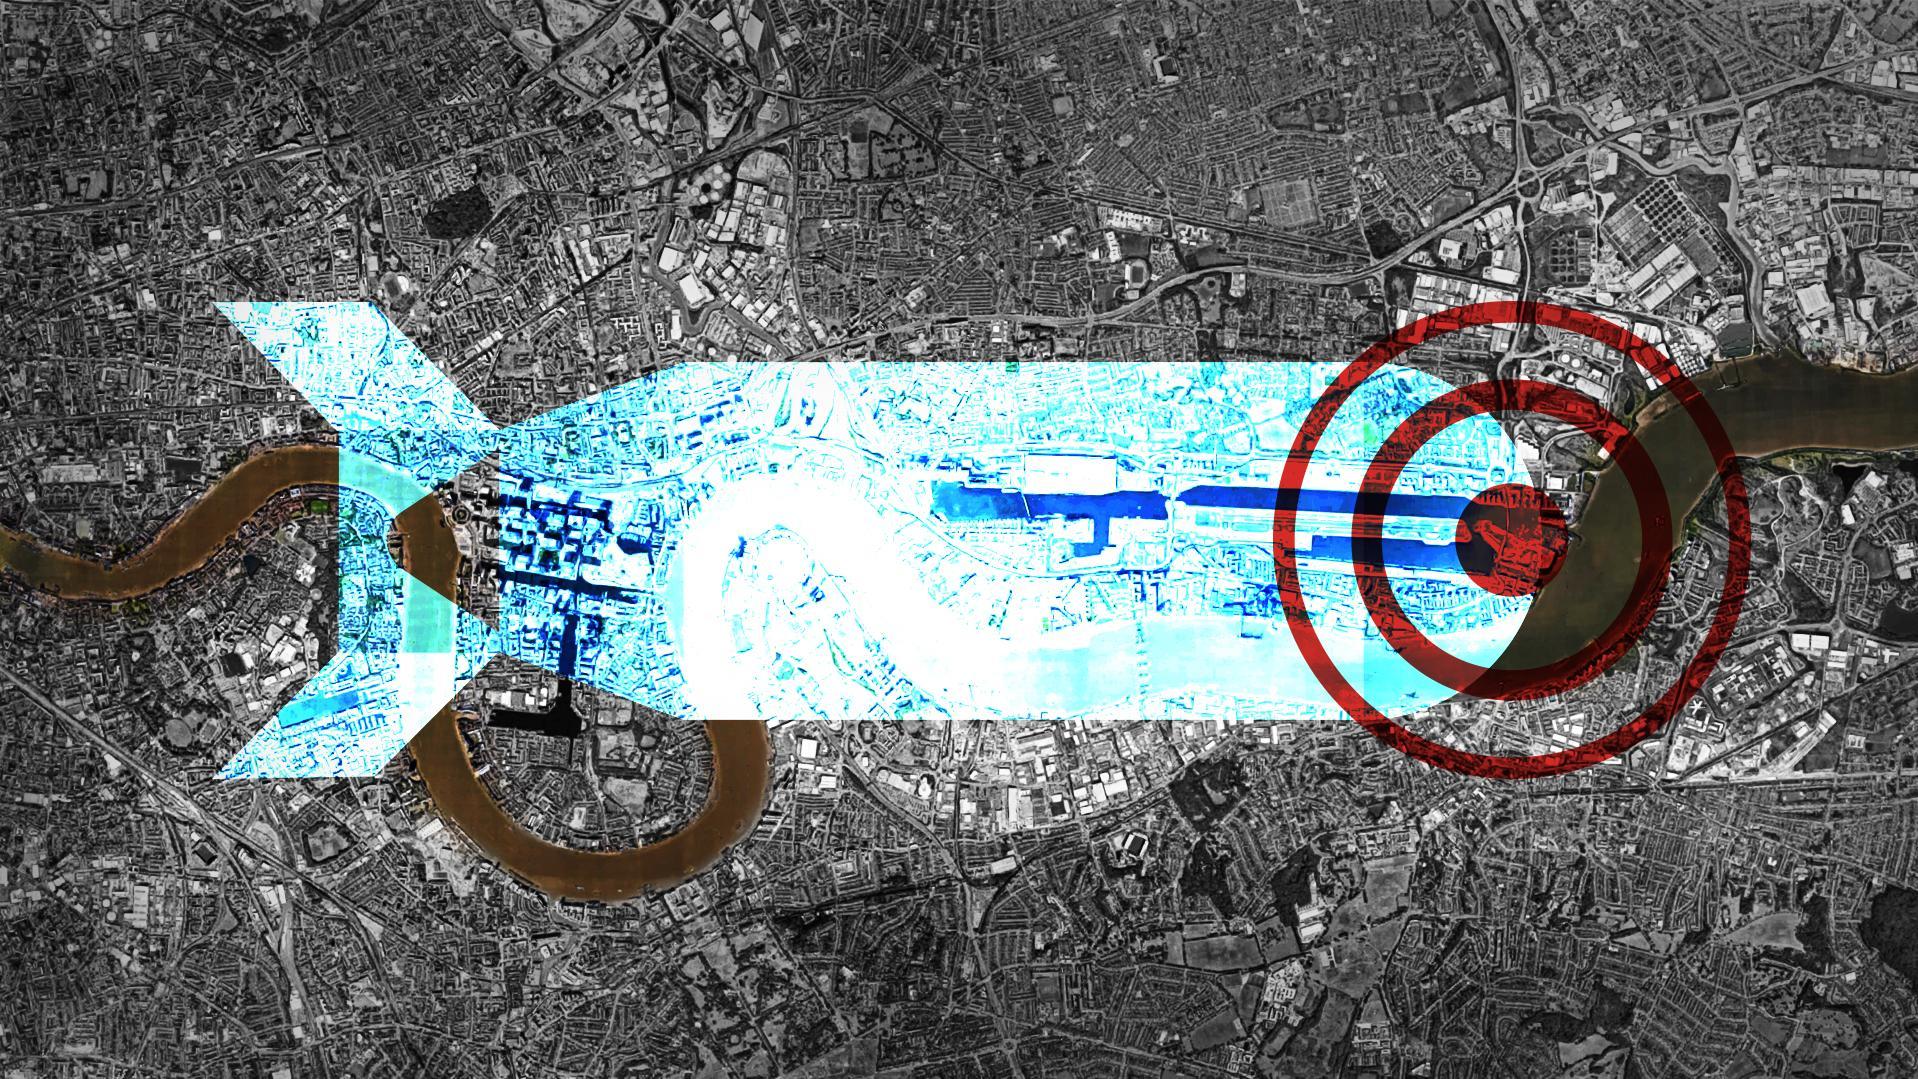 london-bombe-2.jpg